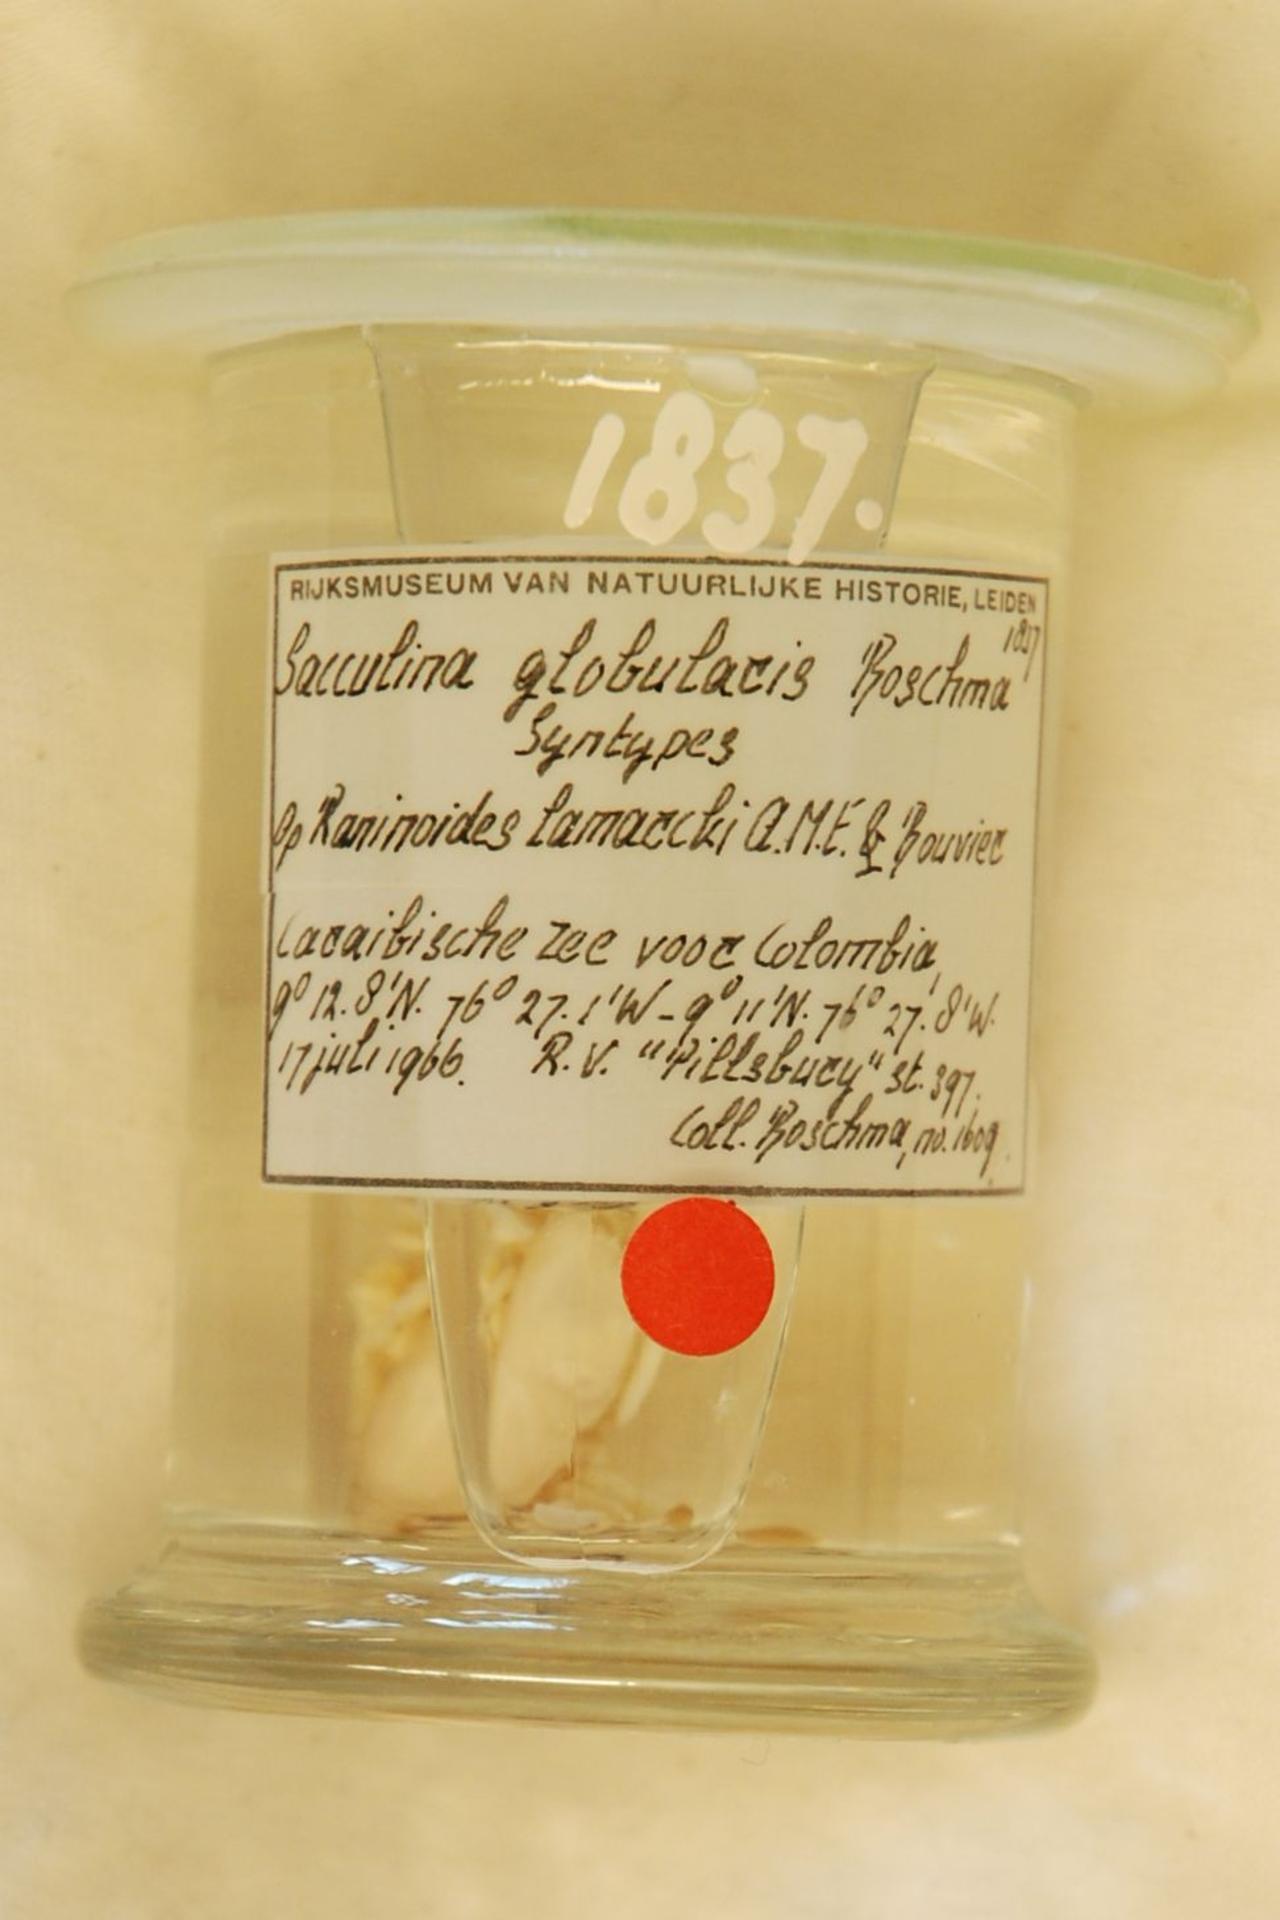 RMNH.CRUS.C.1837 | Sacculina globularis Boschma